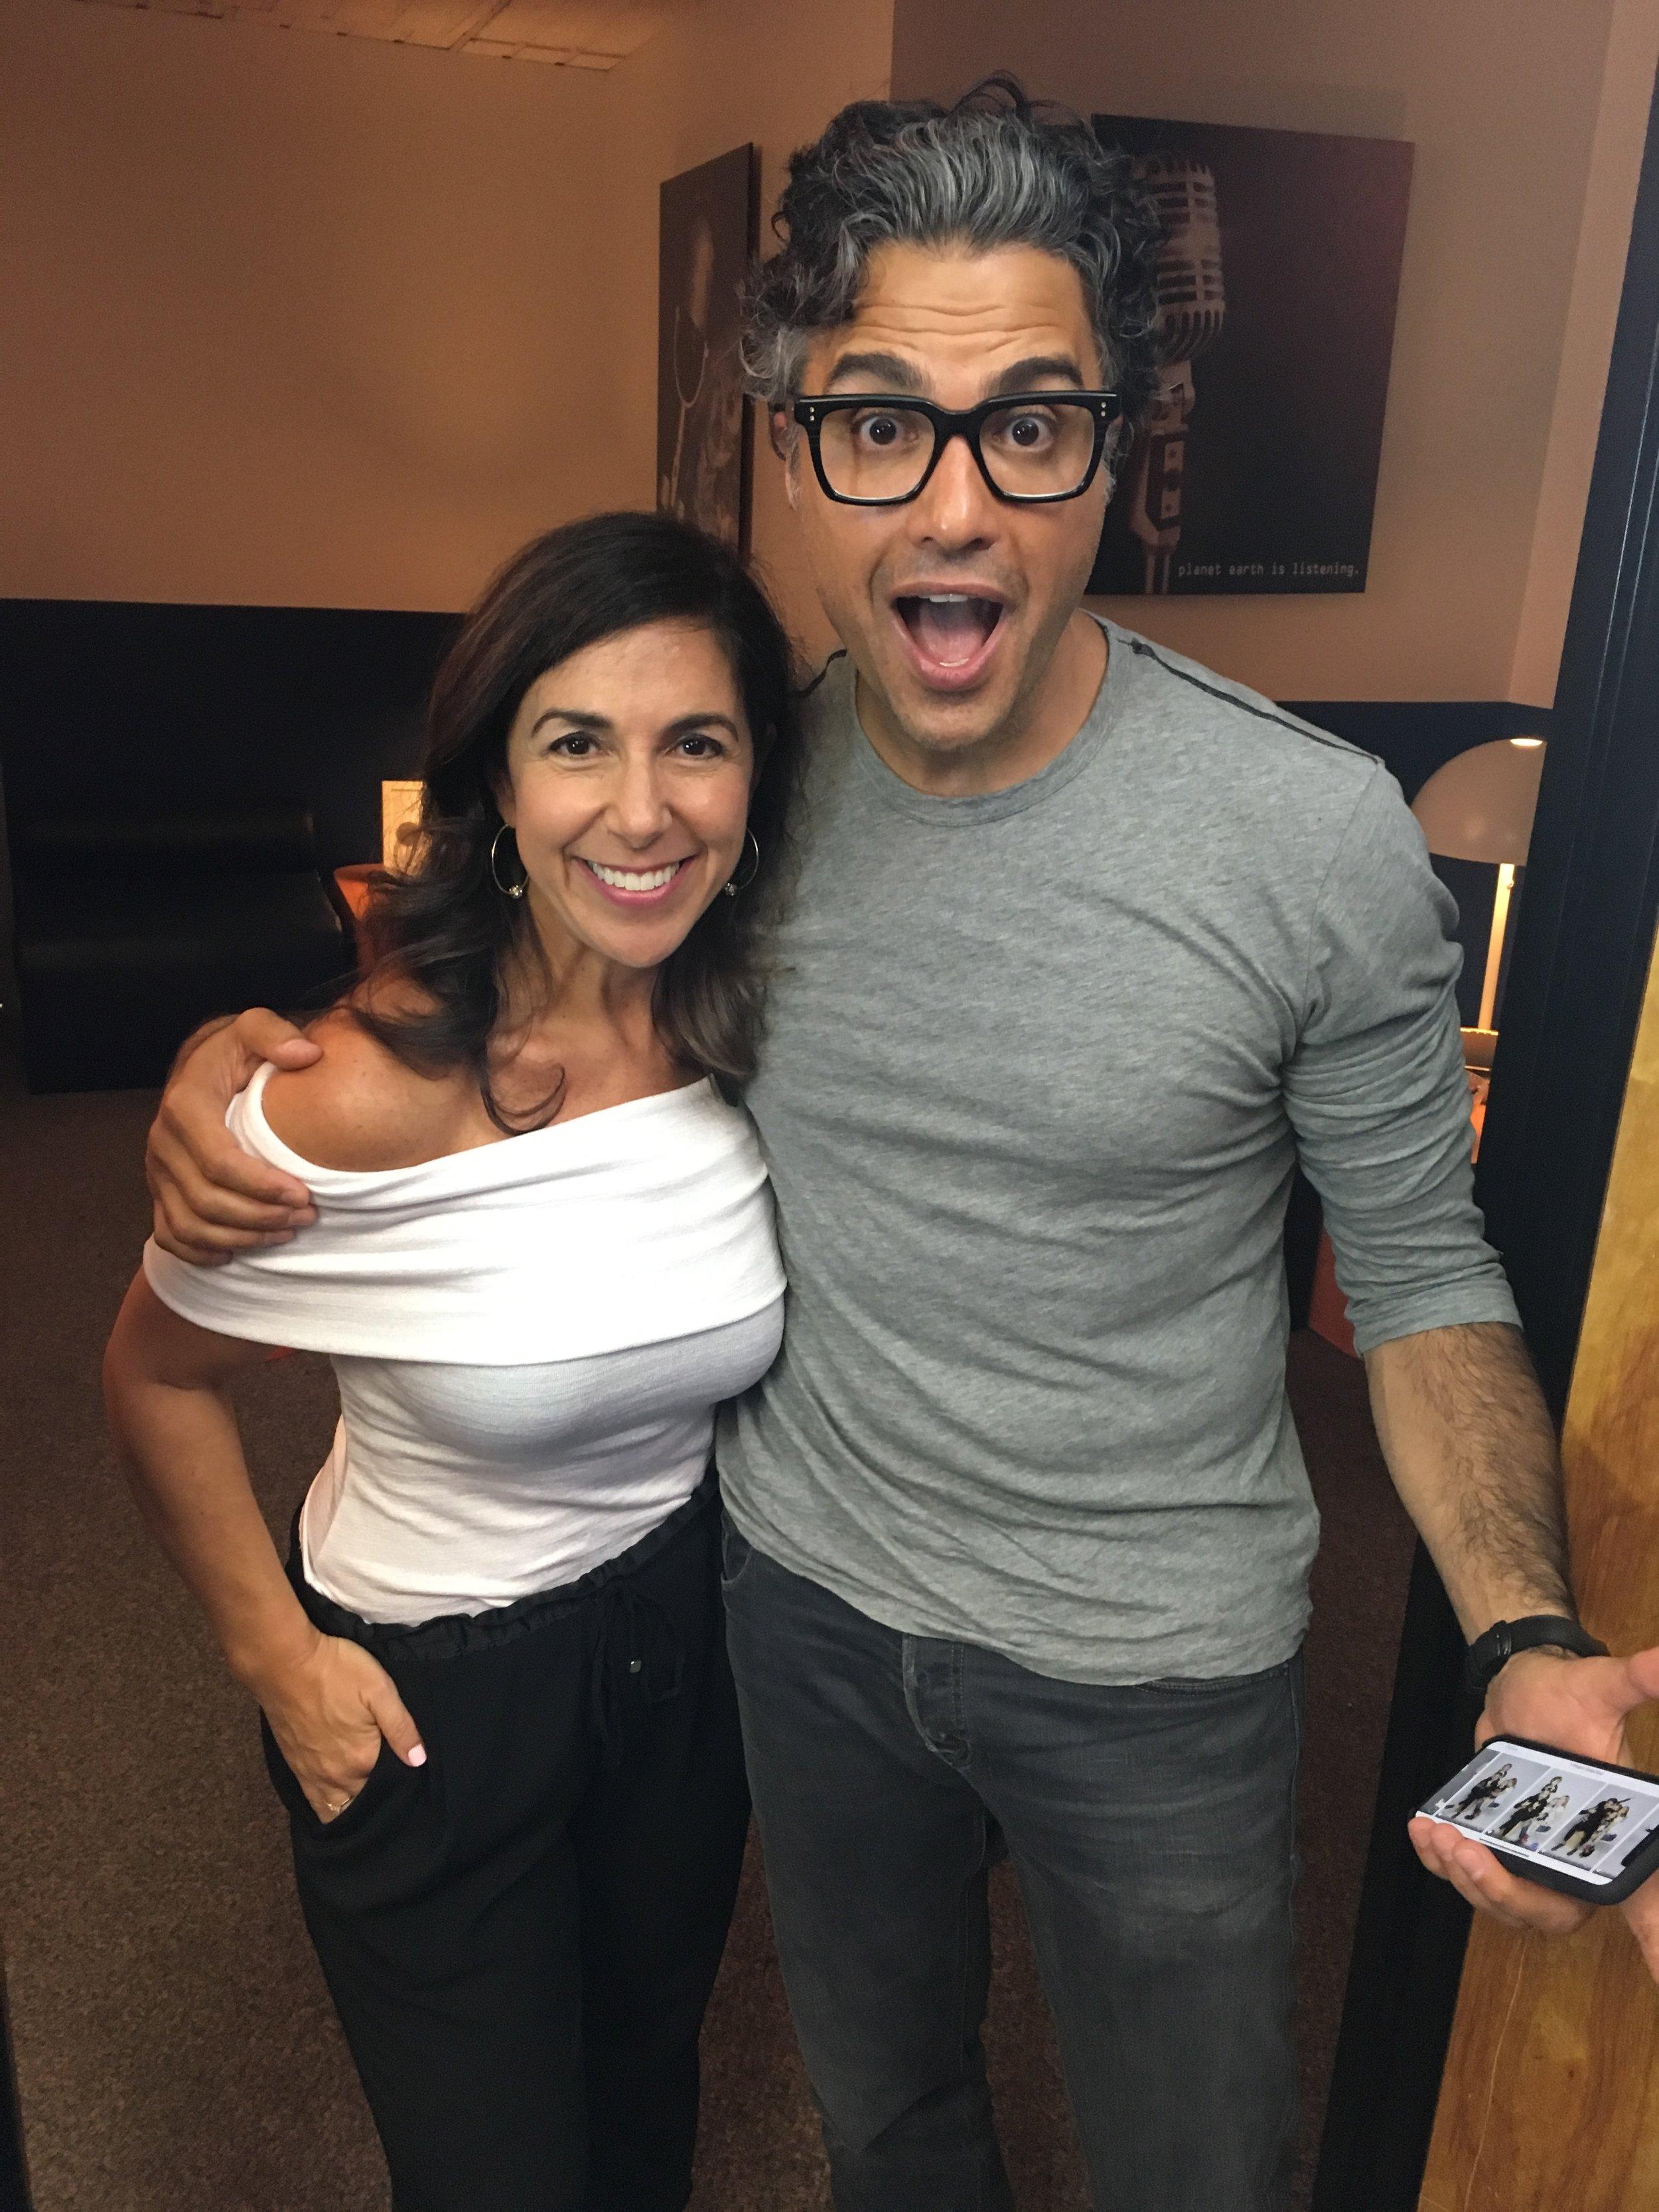 Jaime Camil and Kara Mayer Robinson for Really Famous podcast